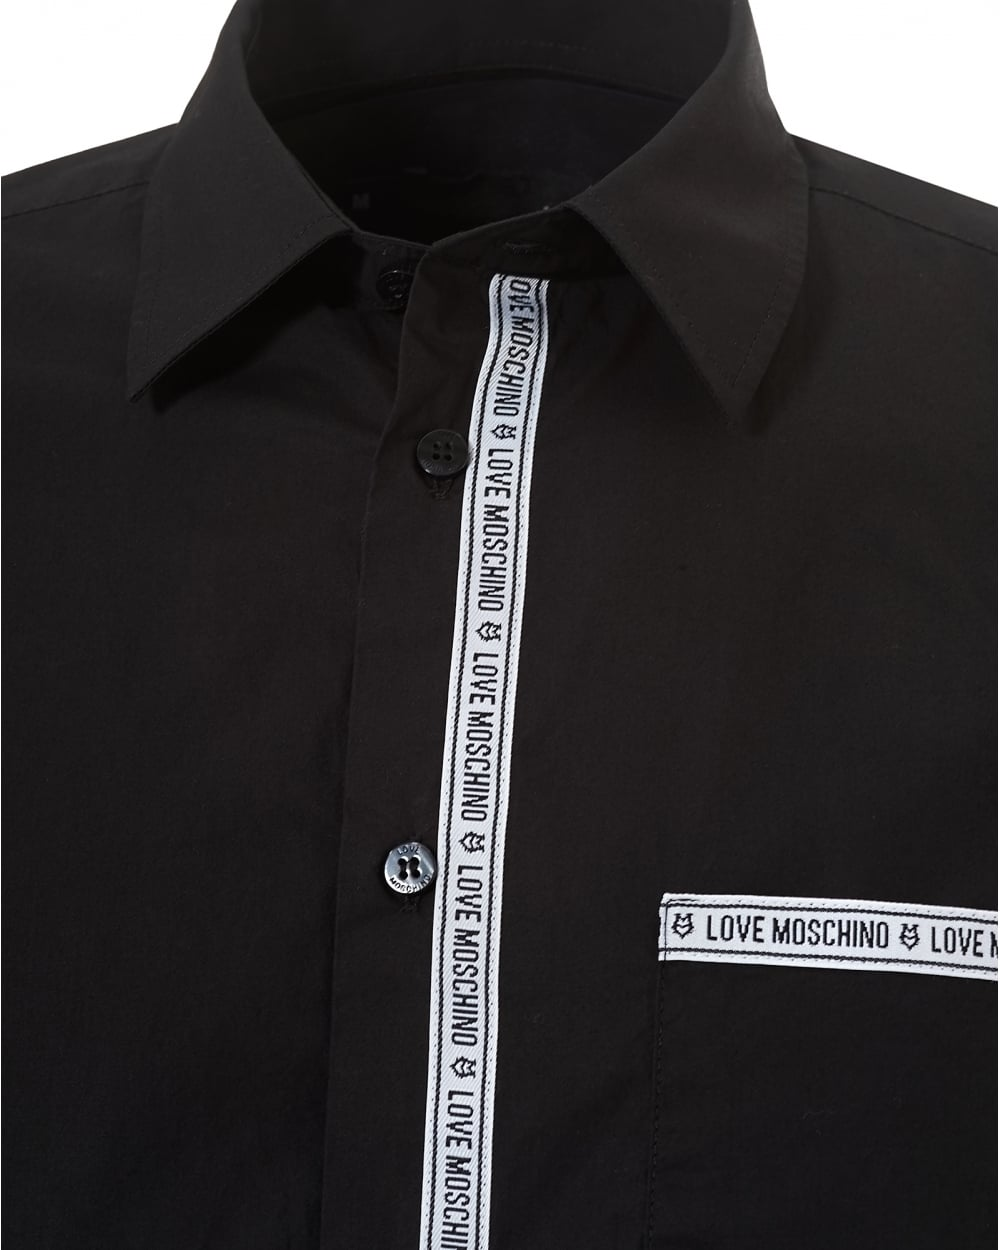 046365f2c57 Love Moschino Mens Repeat Tape Logo Regular Fit Black Shirt